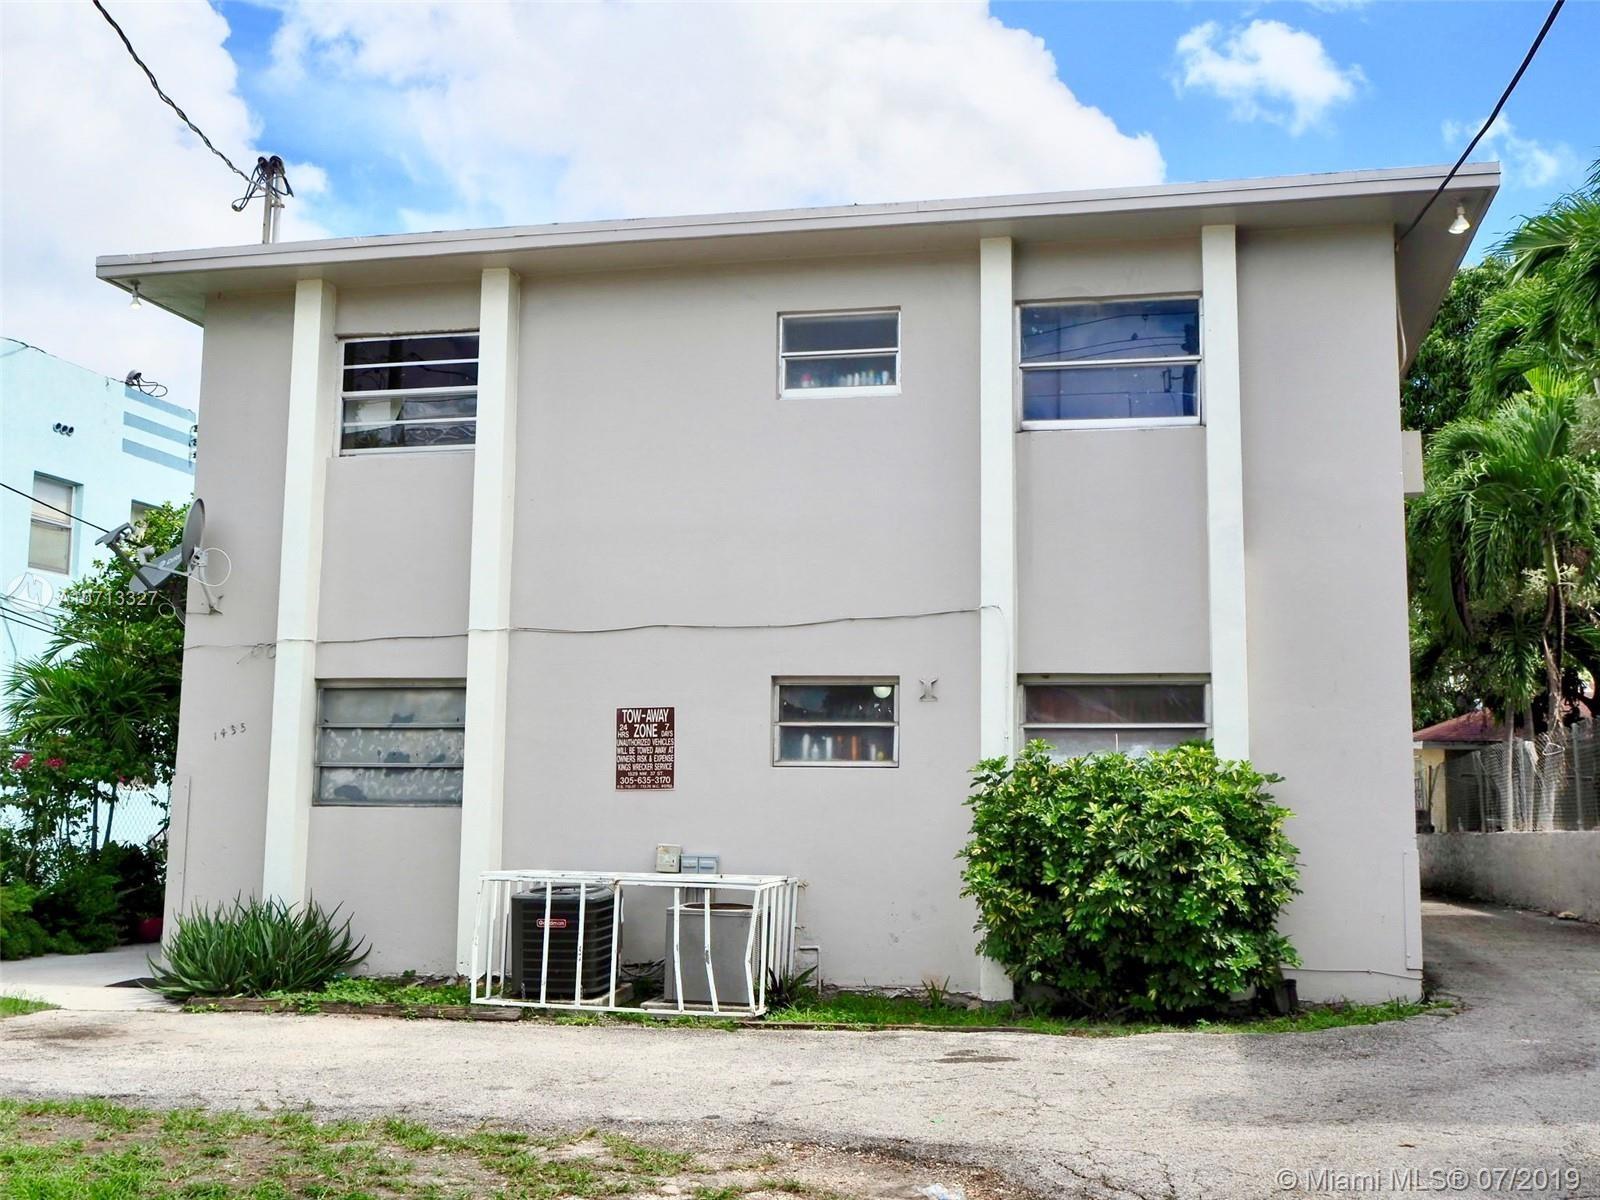 1435 SW 3rd St, Miami, FL 33135